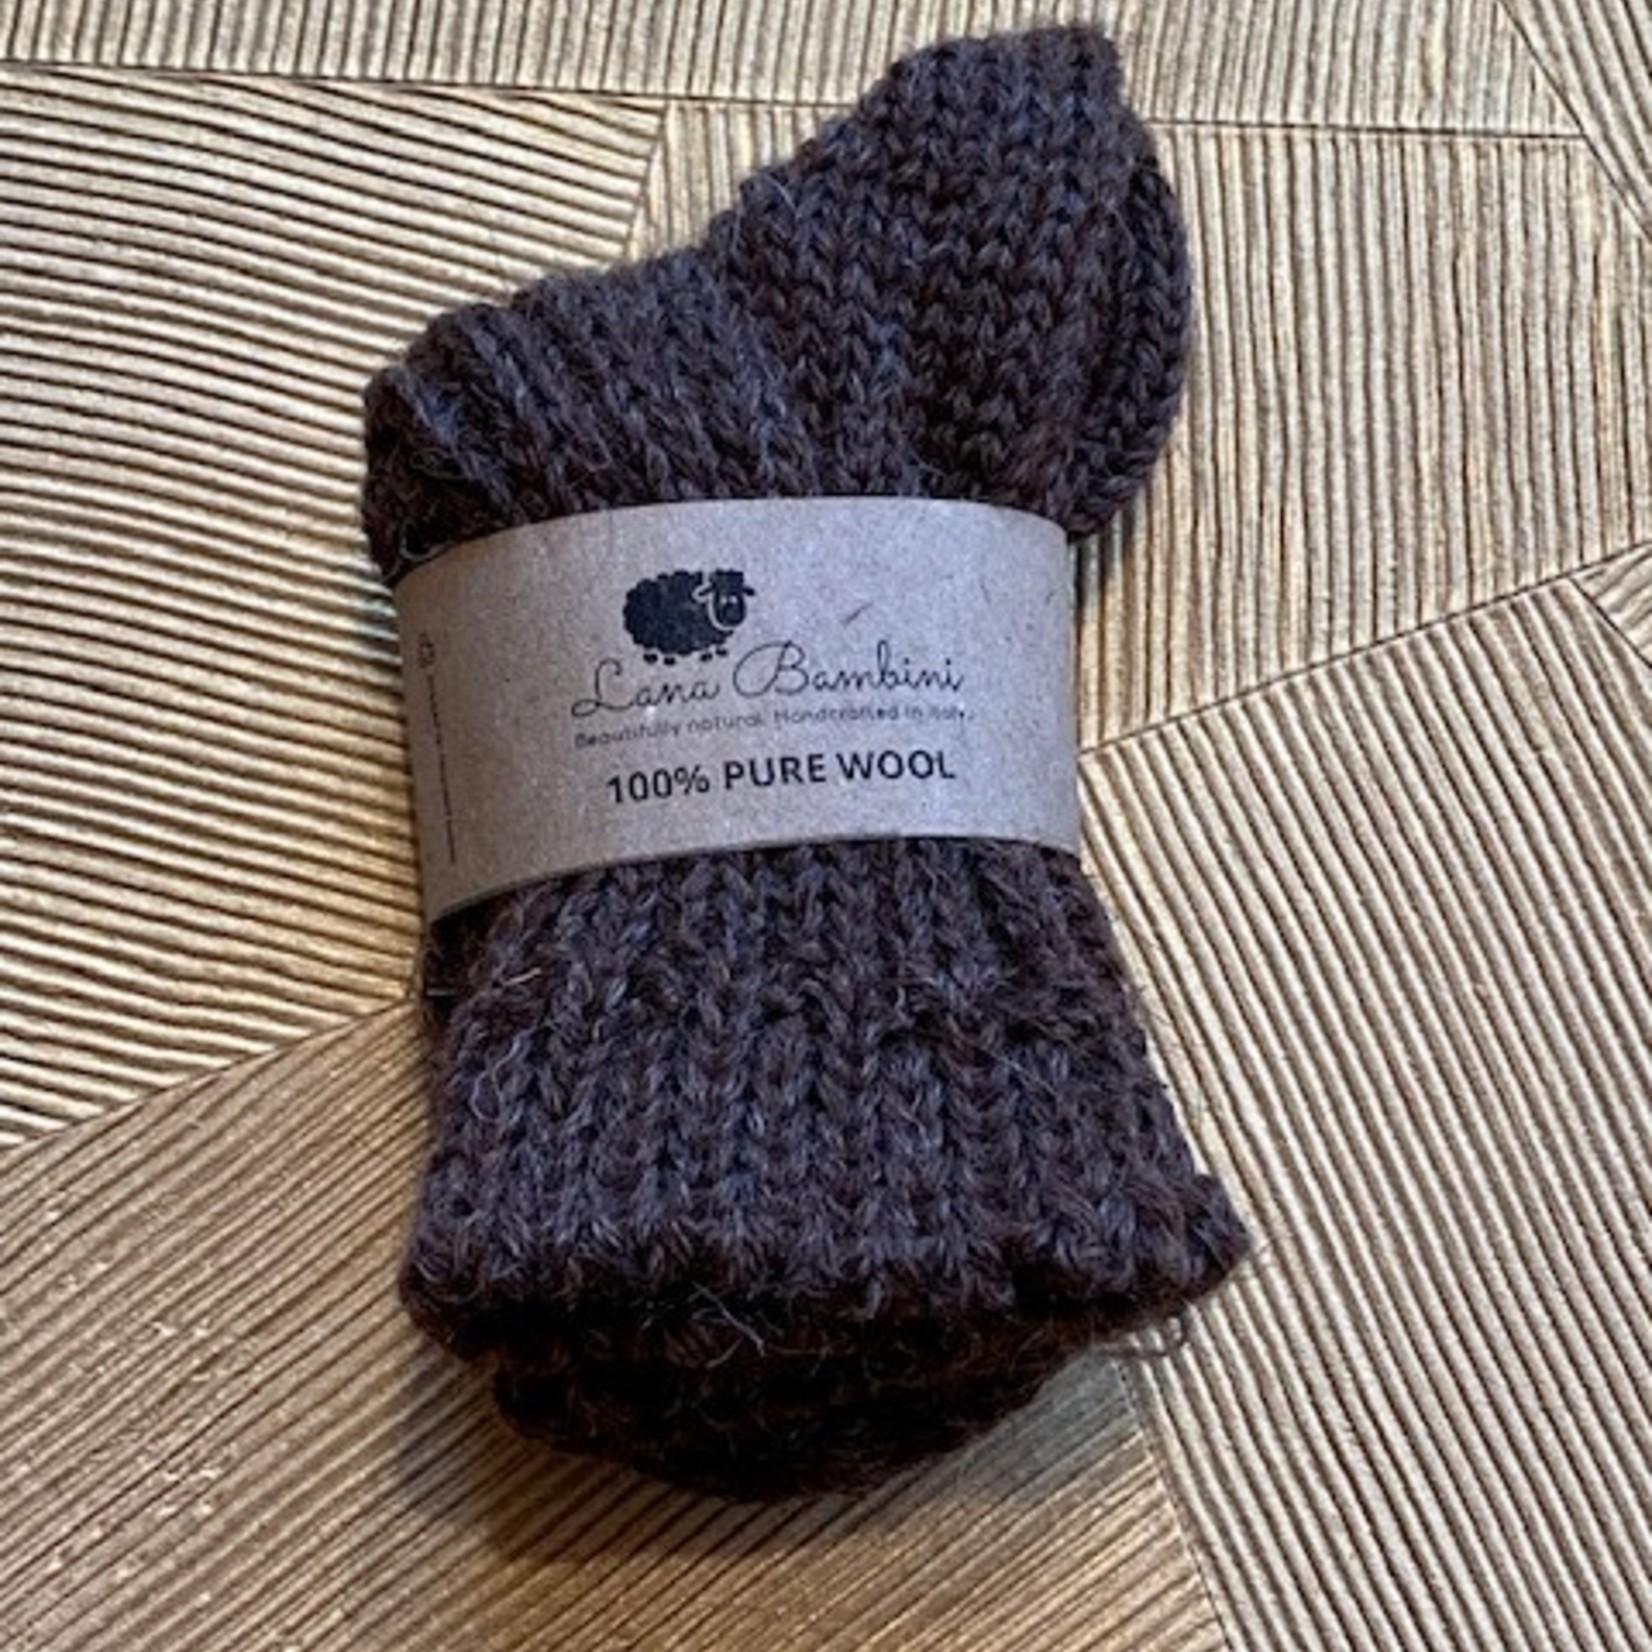 LANA BAMBINI LANA BAMBINI sokken 100% wol dark brown